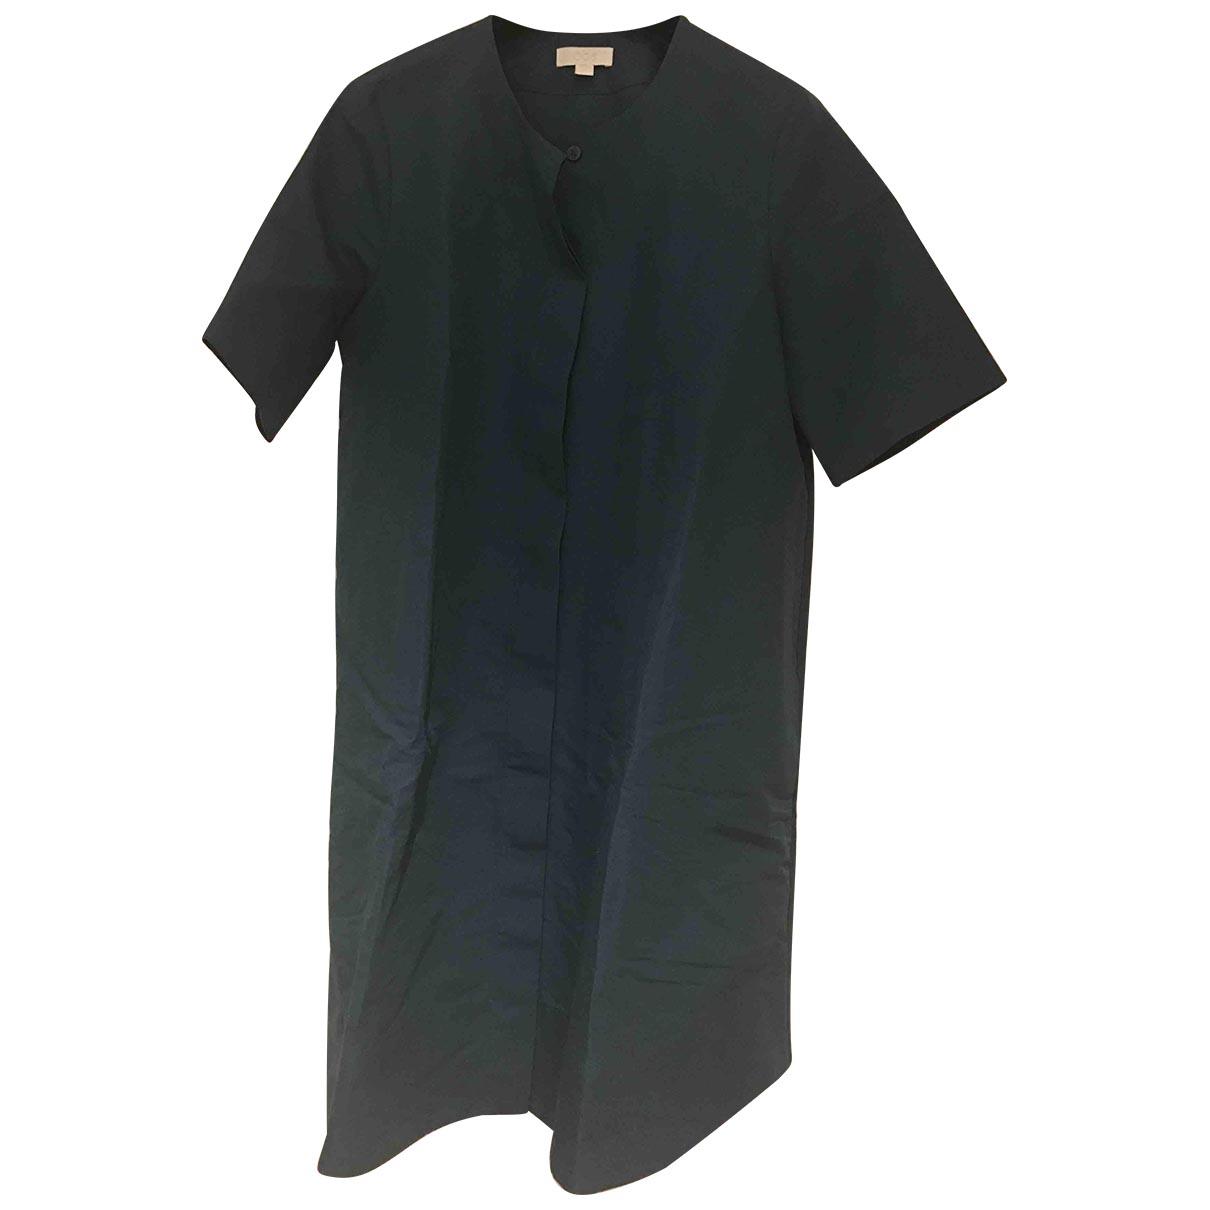 Cos \N Kleid in  Gruen Leinen